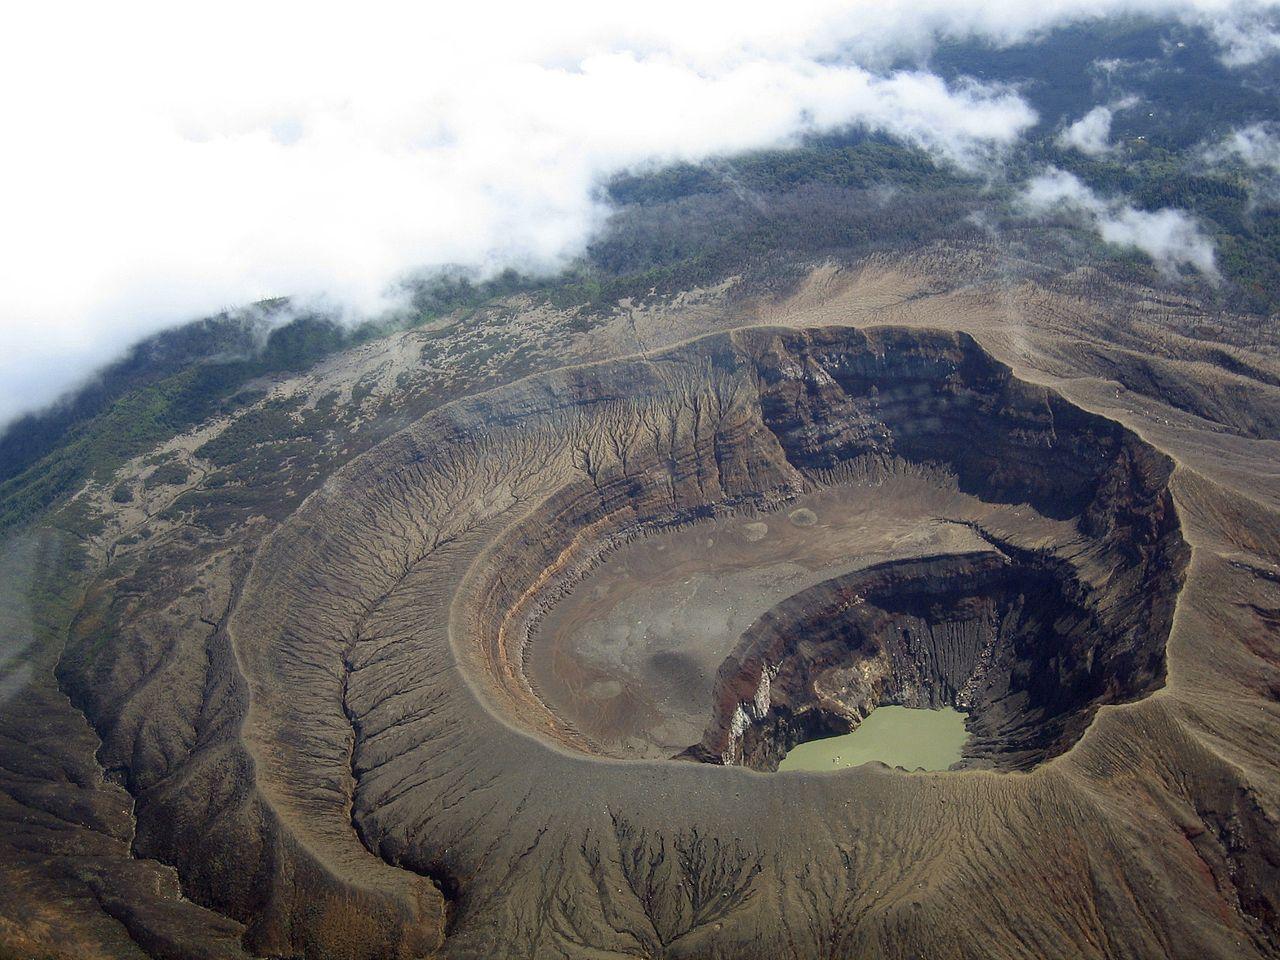 The Caldera of the Santa Anna Volcano